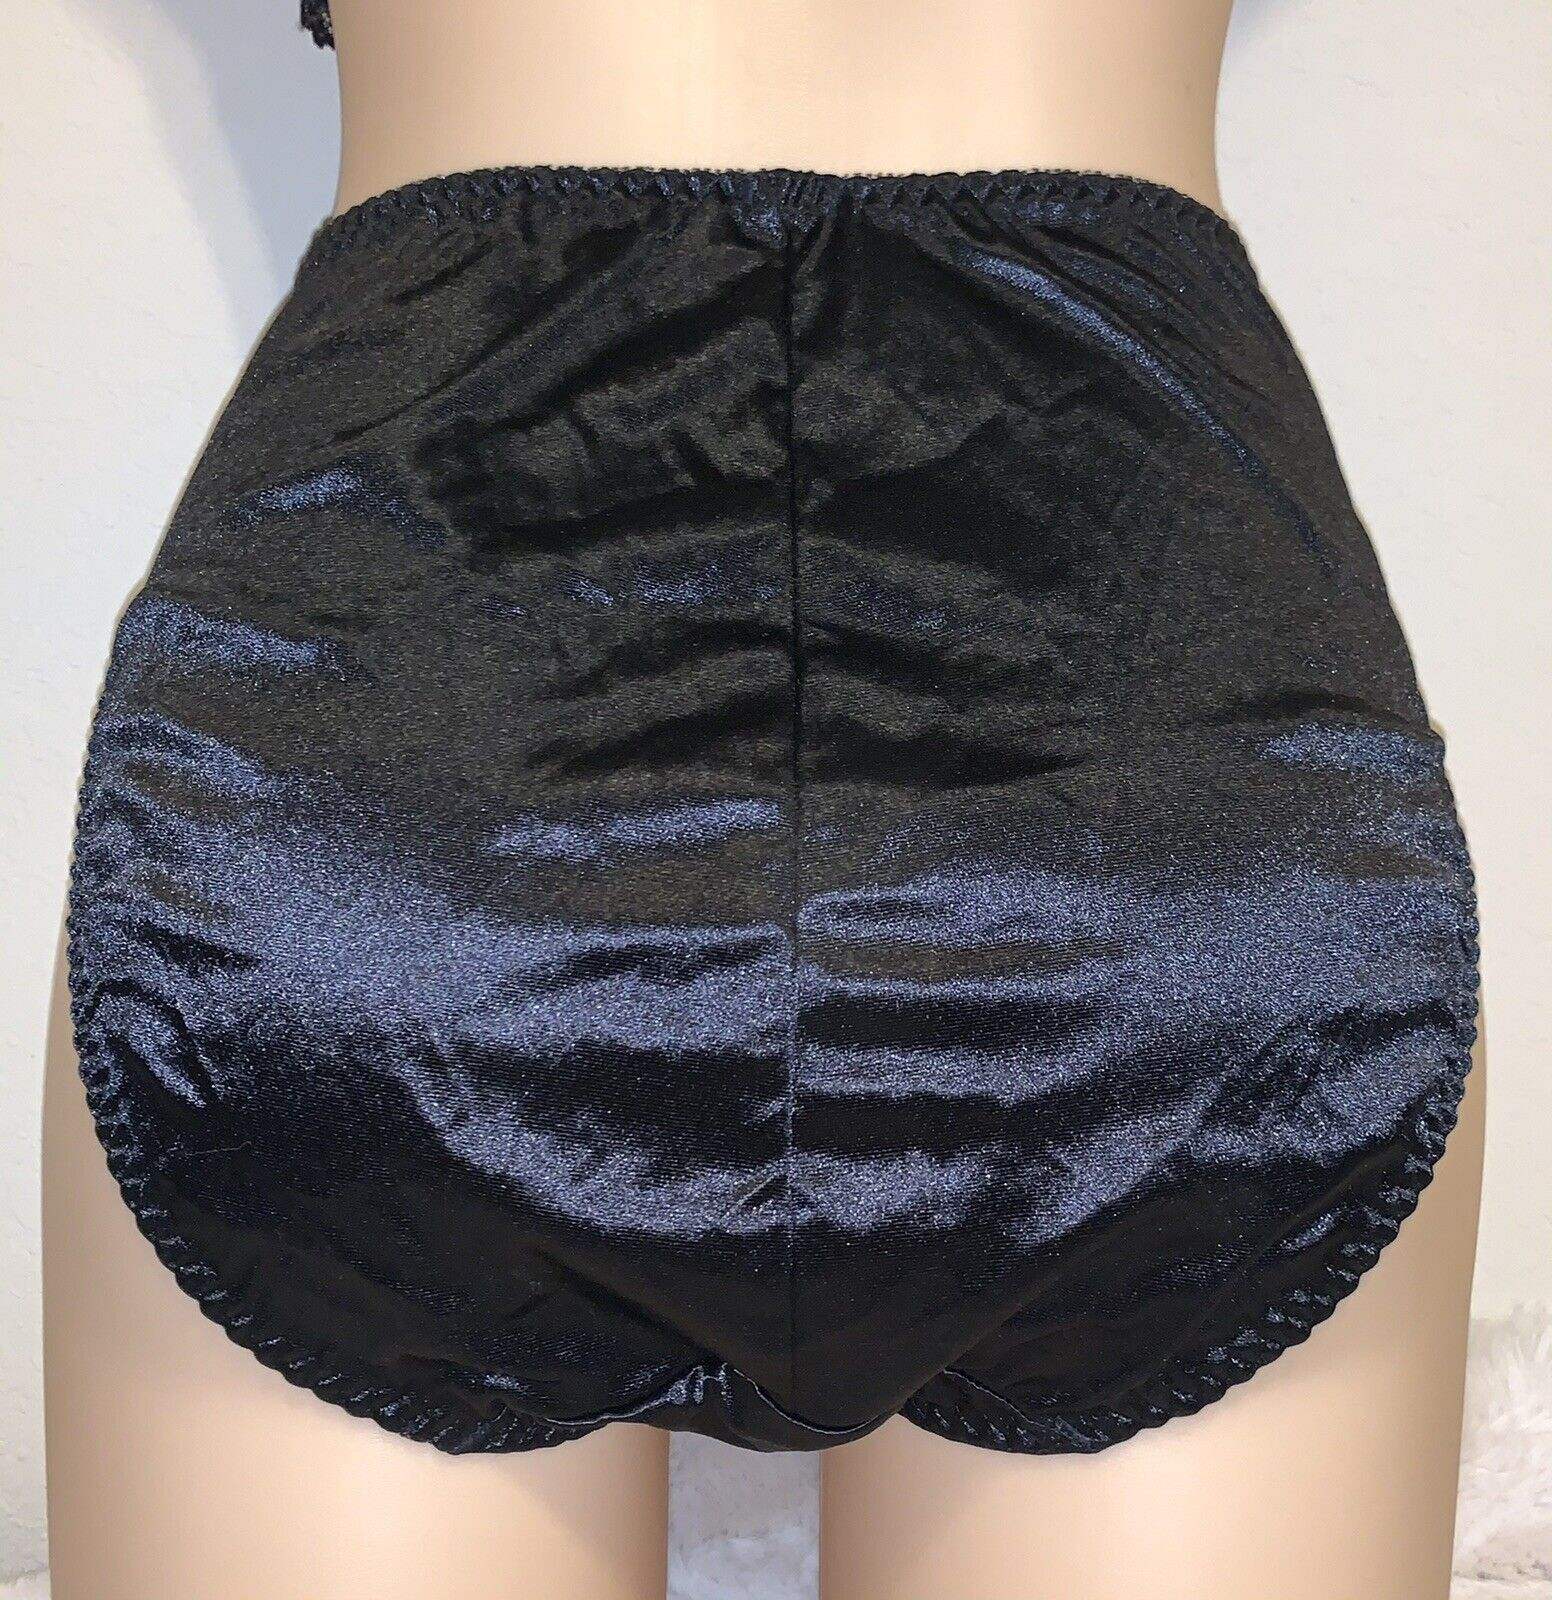 ❤️ VTG VICTORIA SECRET second Skin Satin Brief Panty Sissy Hi Leg Lace M